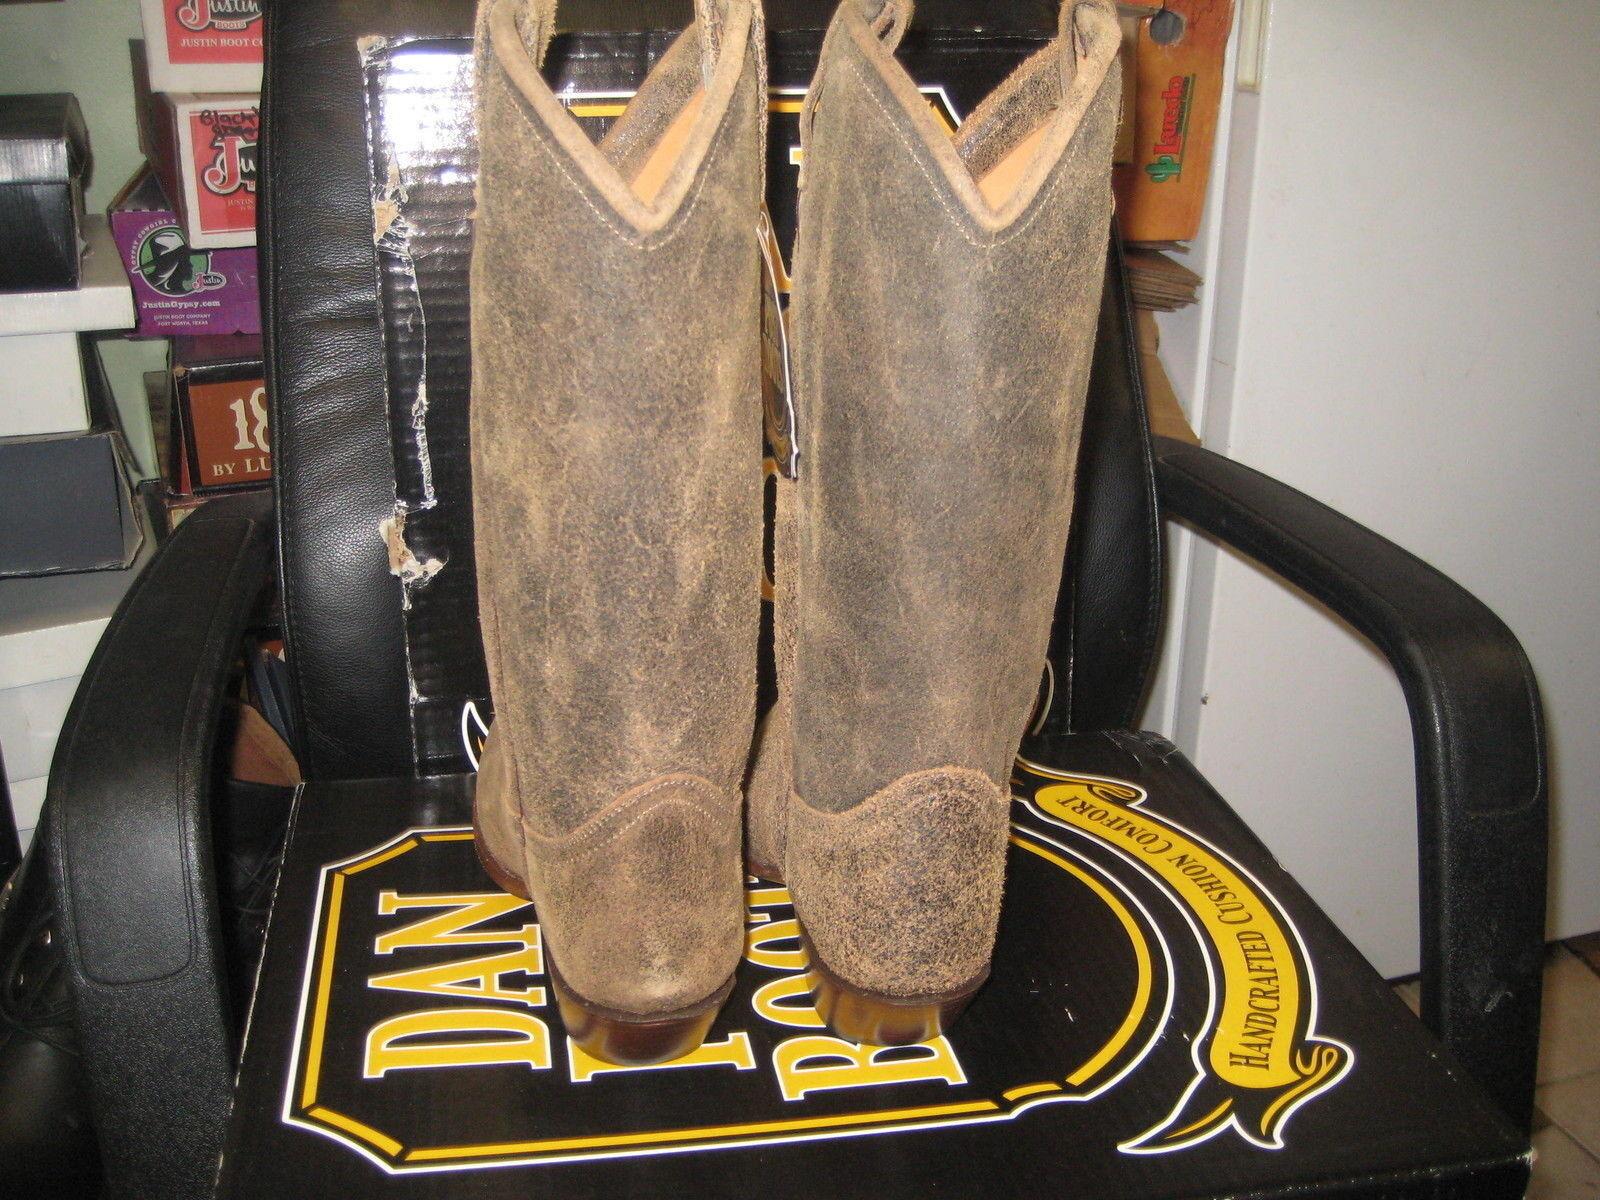 Dan Post para mujer botas occidentales DP3262 roughie (tan) Talla Talla Talla 10 M Nuevo f442c6